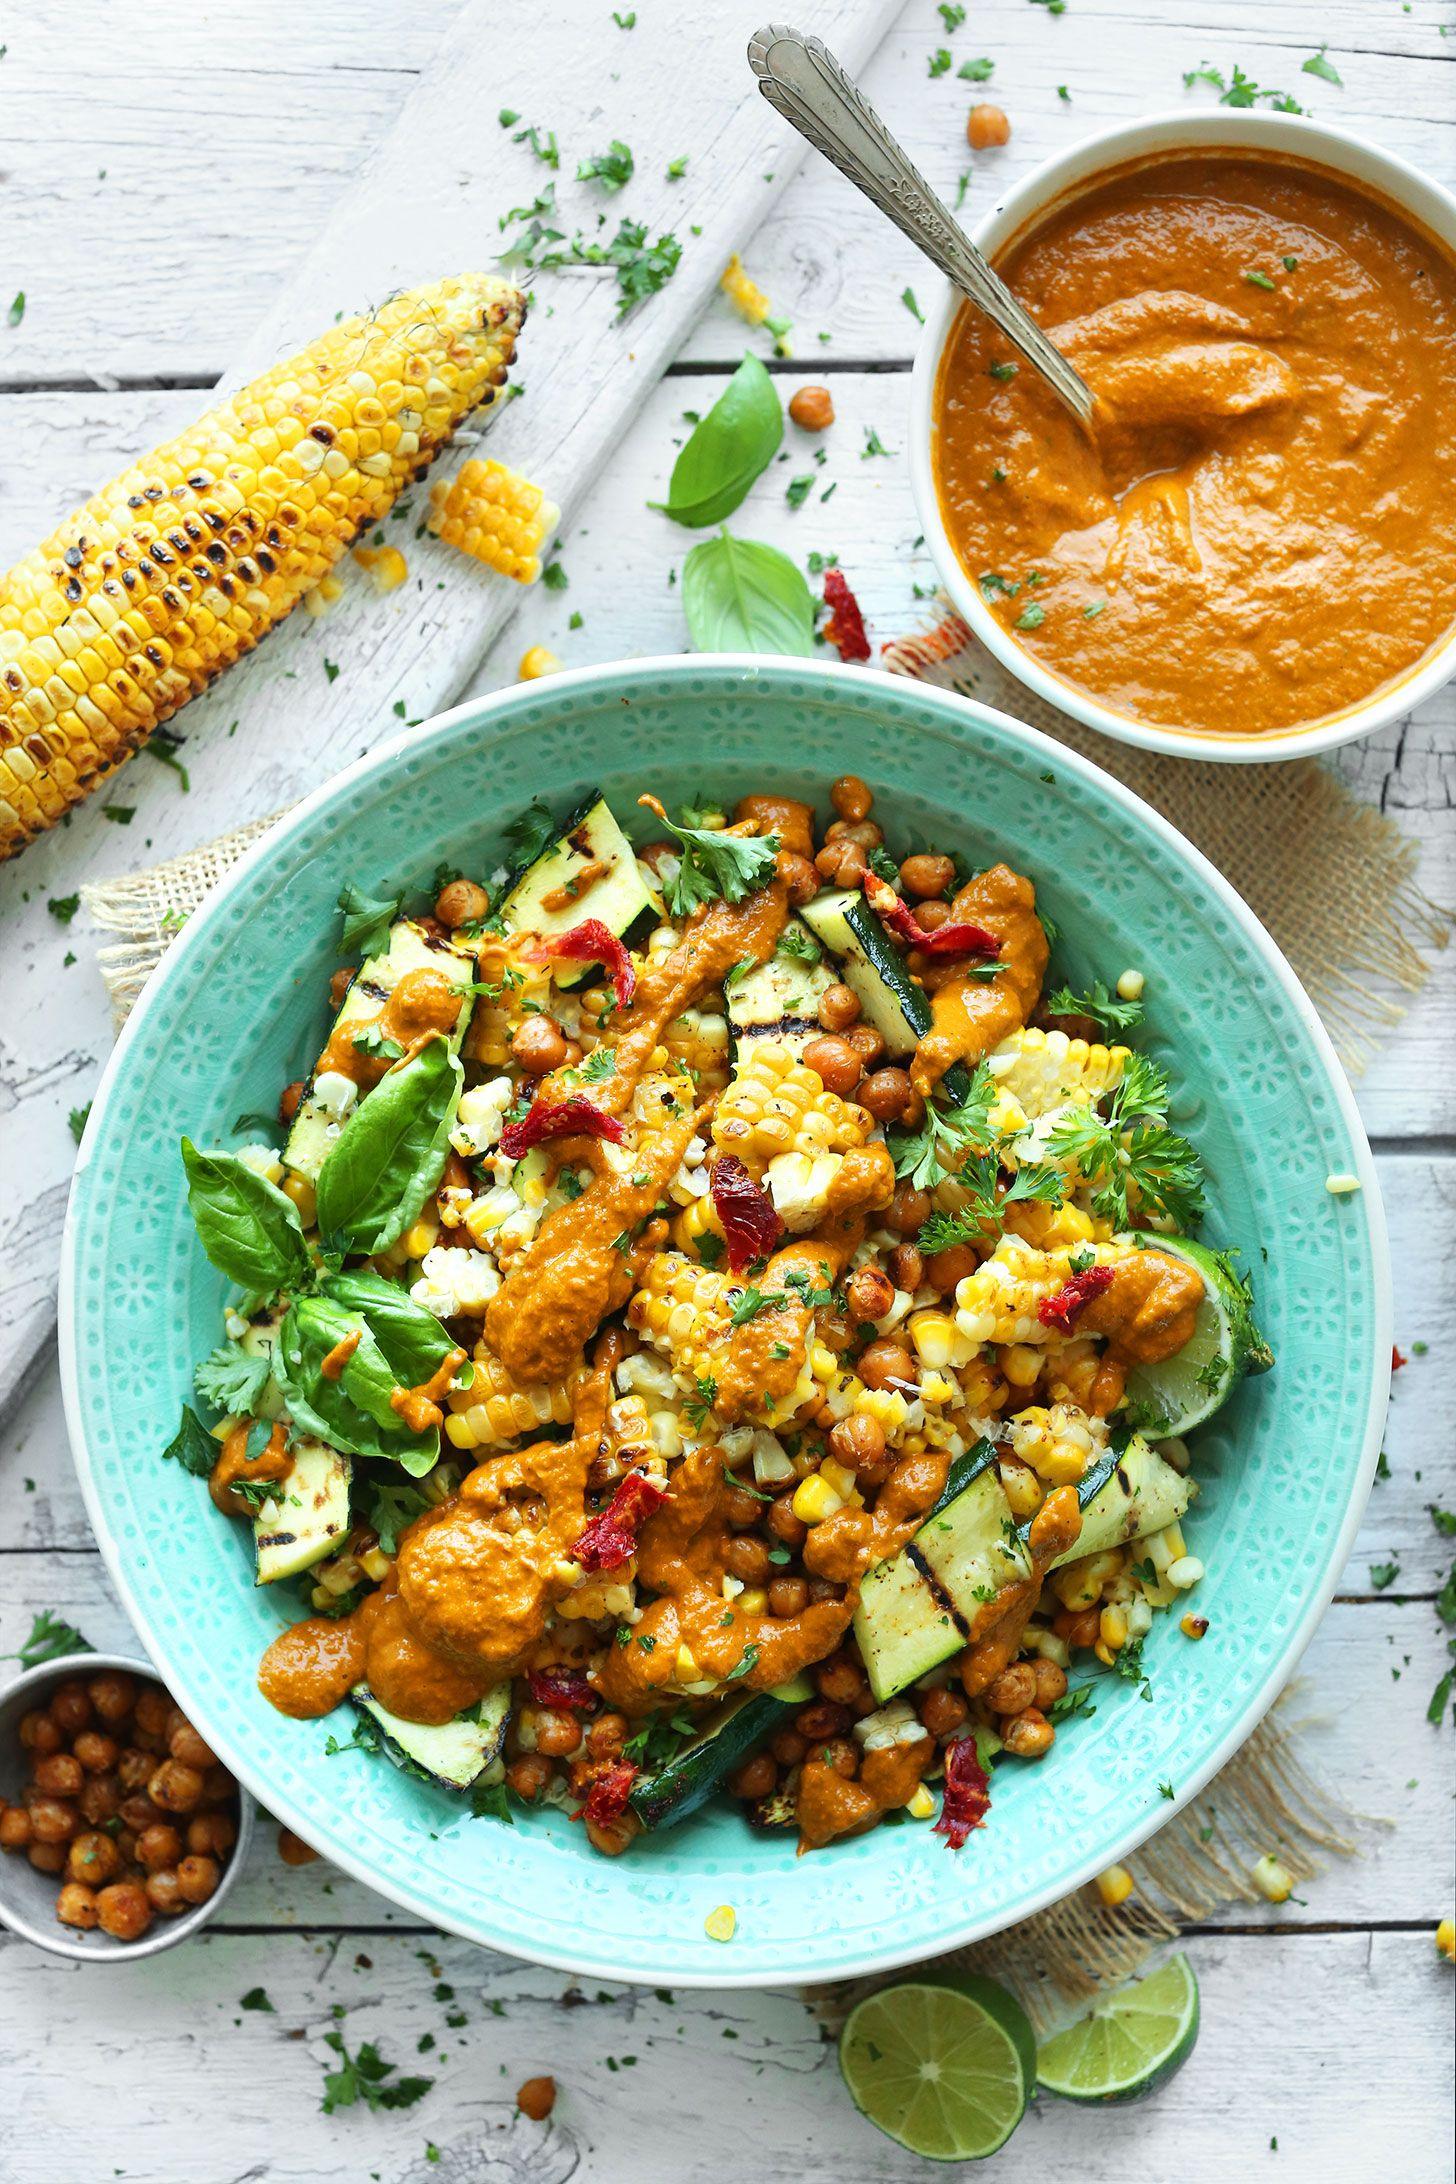 Grilled Corn & Zucchini Salad with Sun-Dried Tomato Vinaigrette SUMMERY 30-minute Zucchini & Grilled Corn Salad with crispy chickpeas and Sun-Dried Tomato Vinaigrette!